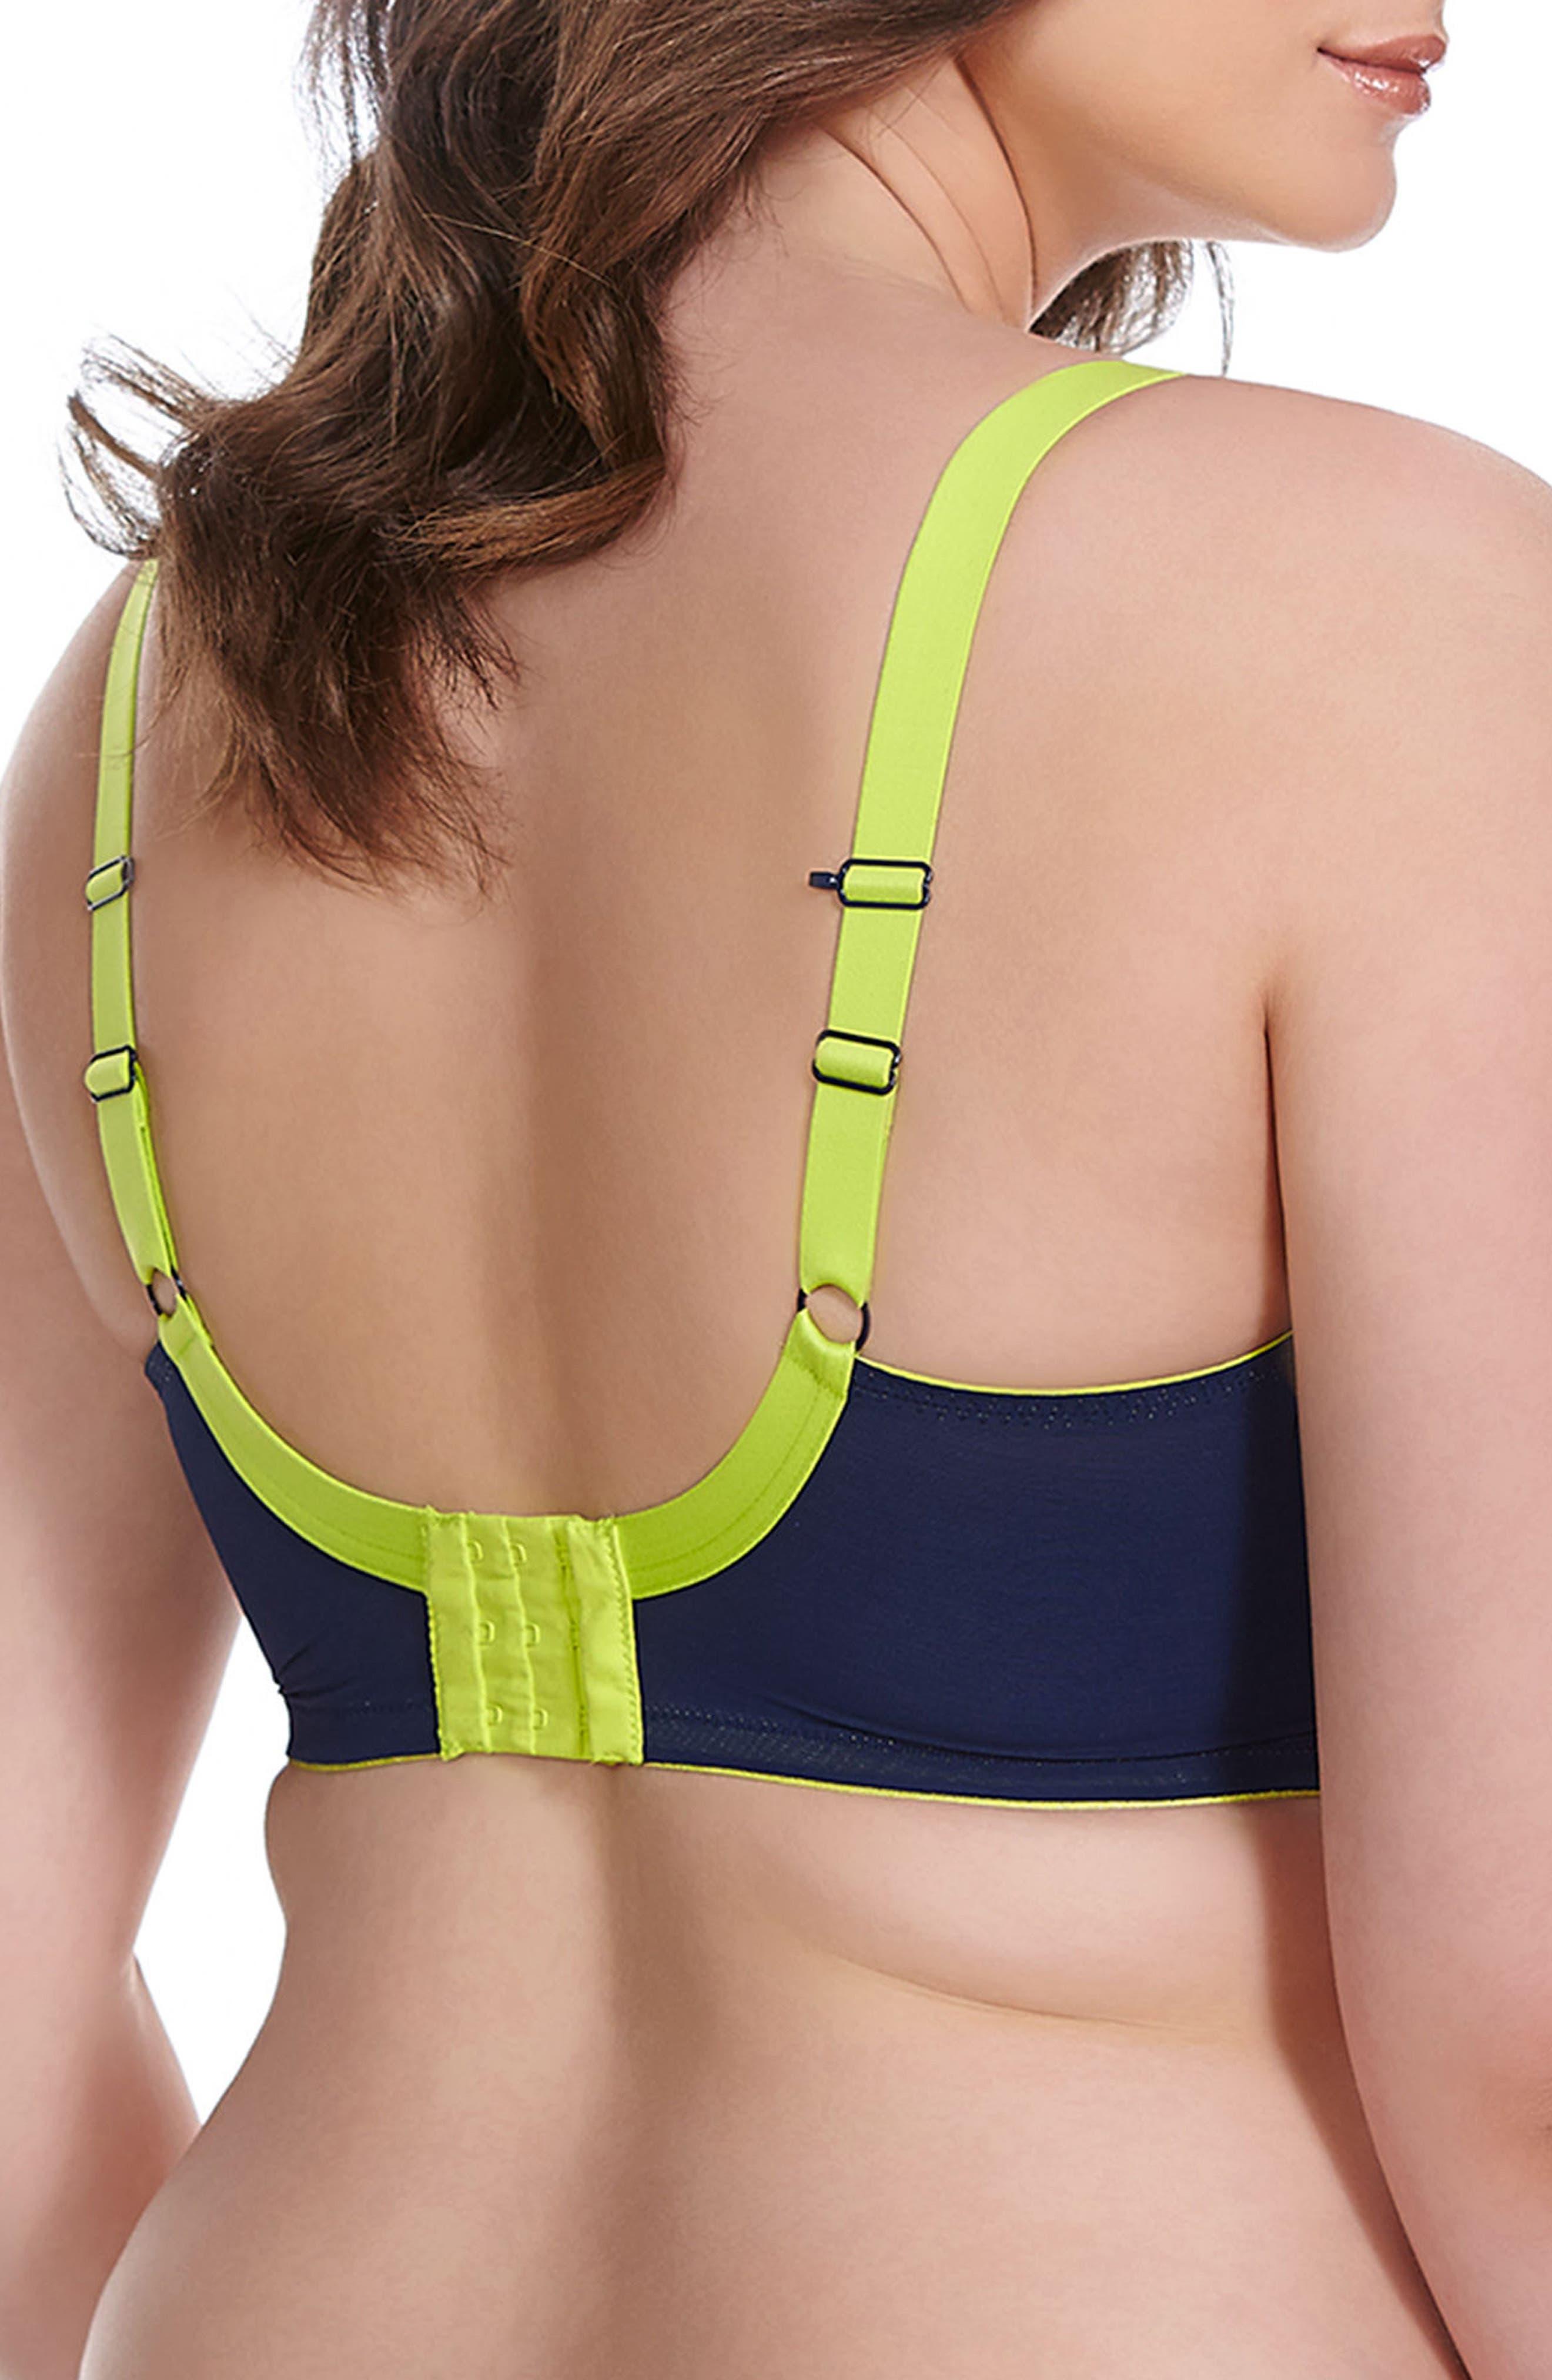 Elomi Energise Sports Bra (Plus Size)